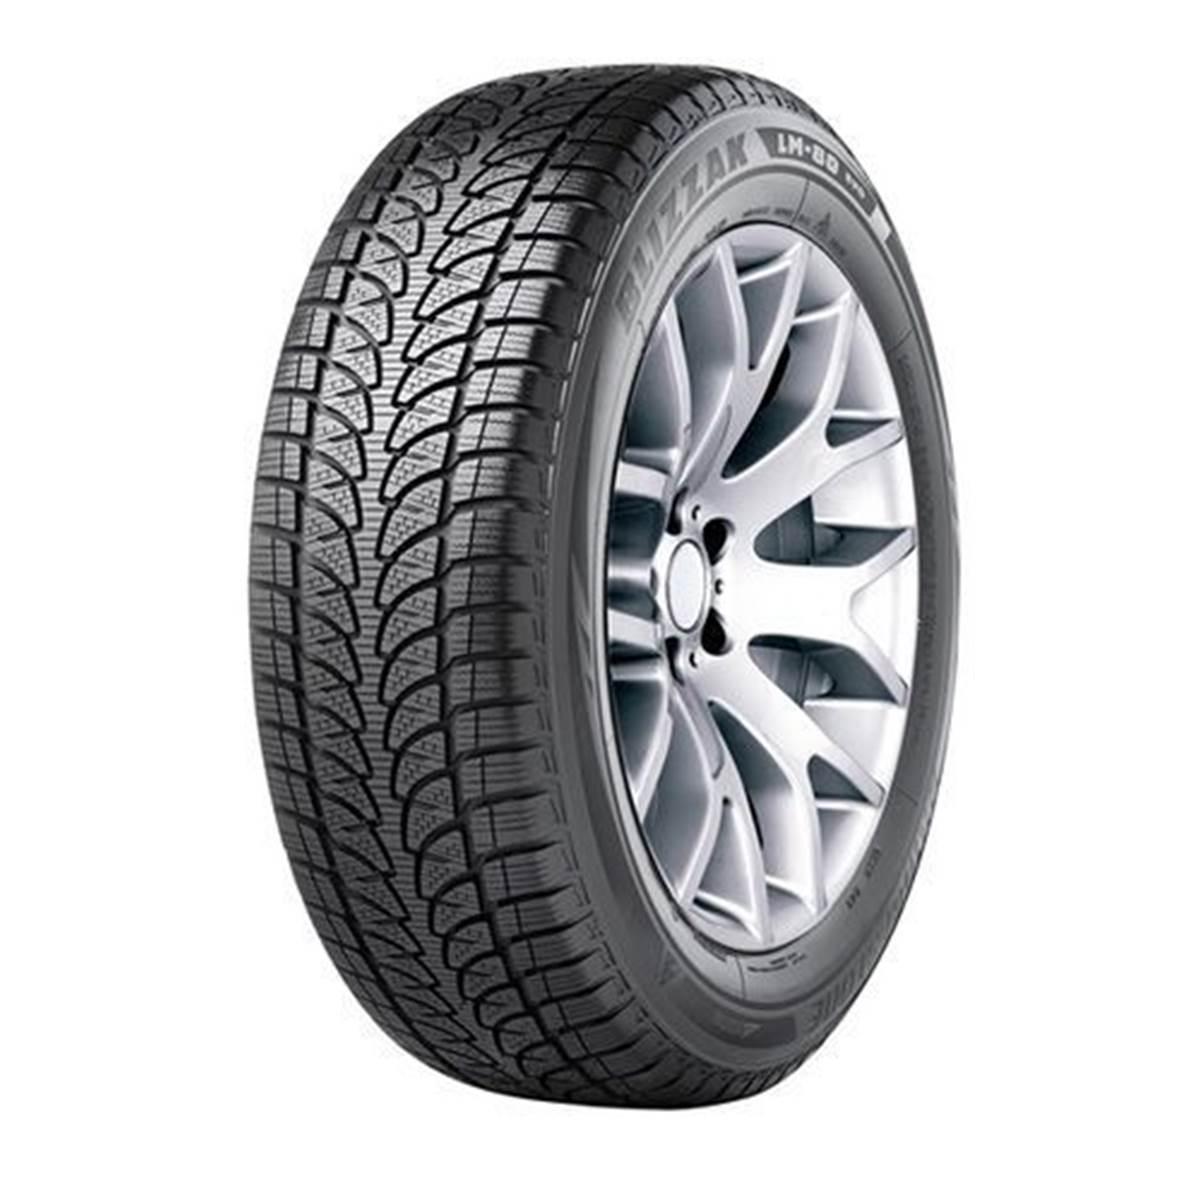 Pneu 4X4 Hiver Bridgestone 235/55R19 105V Blizzak Lm80 XL